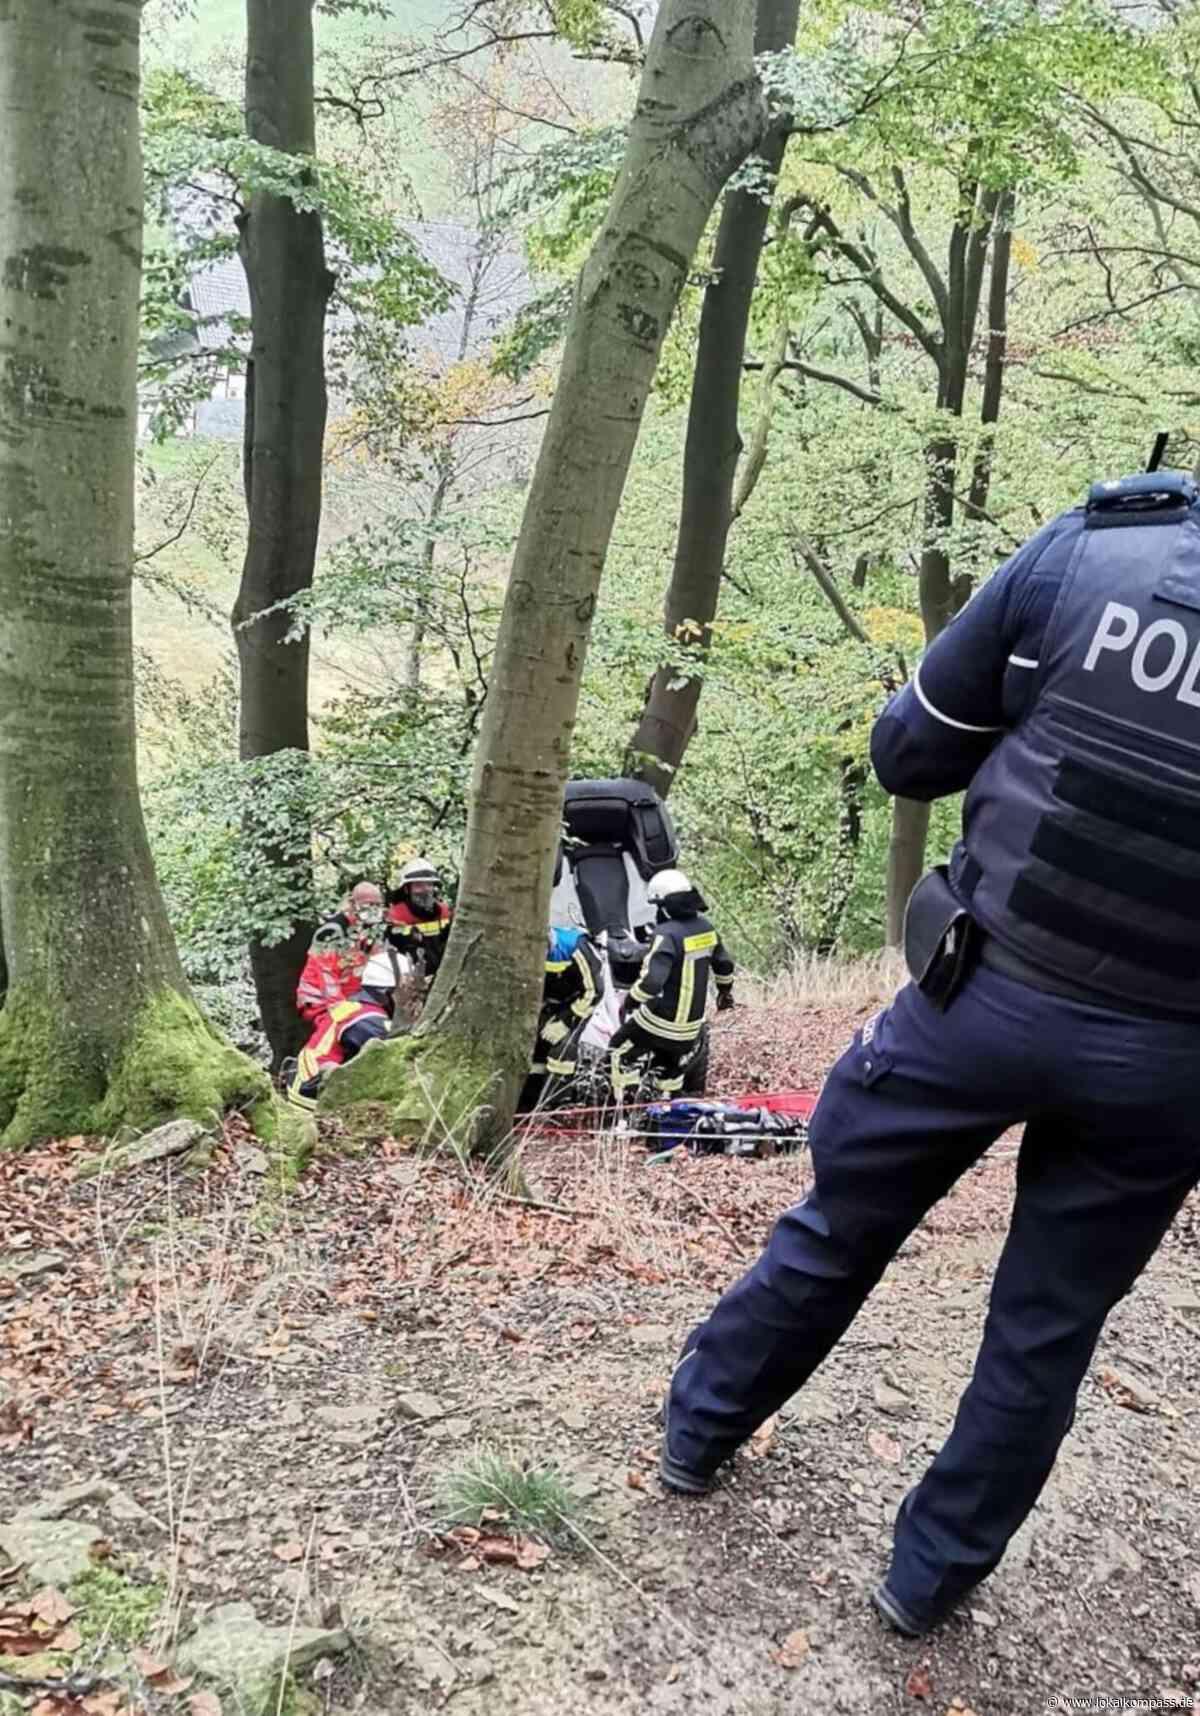 Schwerer Unfall auf dem Deilbachweg in Hattingen: Quad stürzt Böschung herunter - Hattingen - Lokalkompass.de